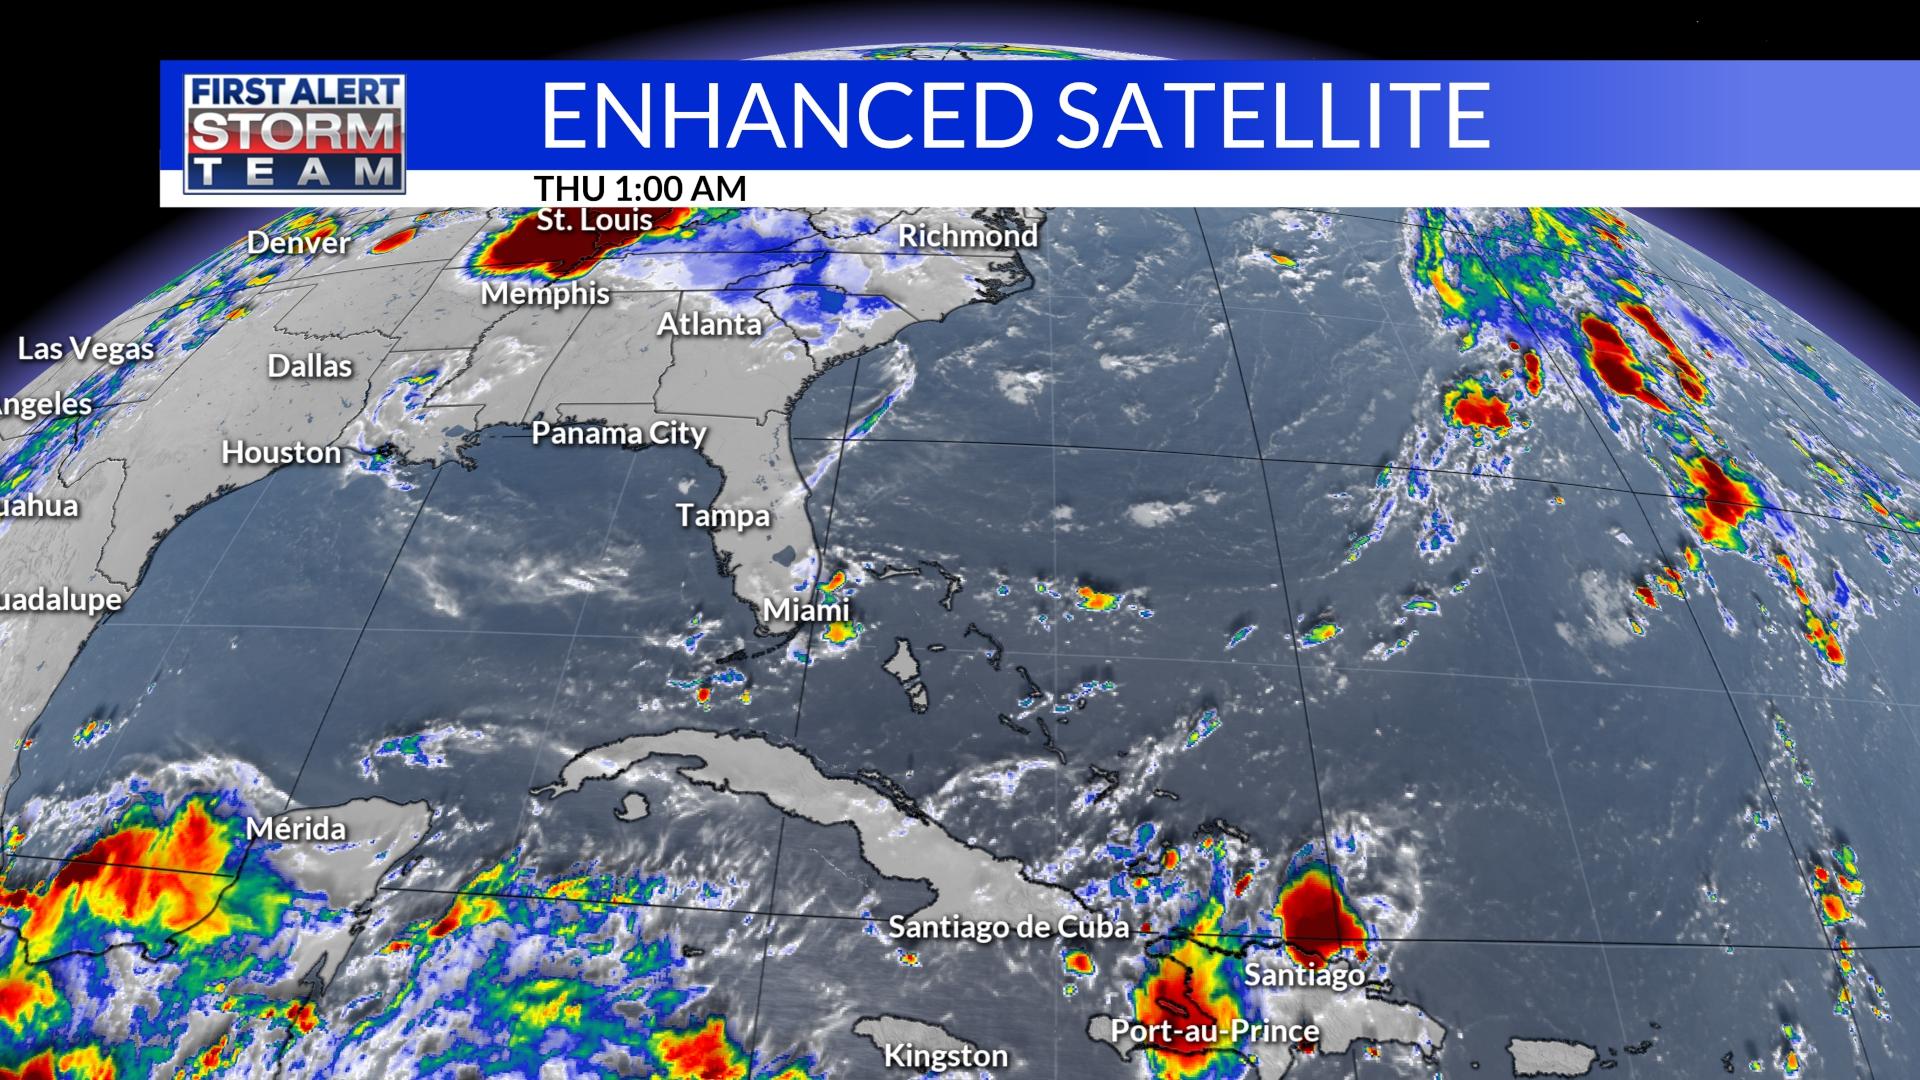 Tropics Enhanced Satellite